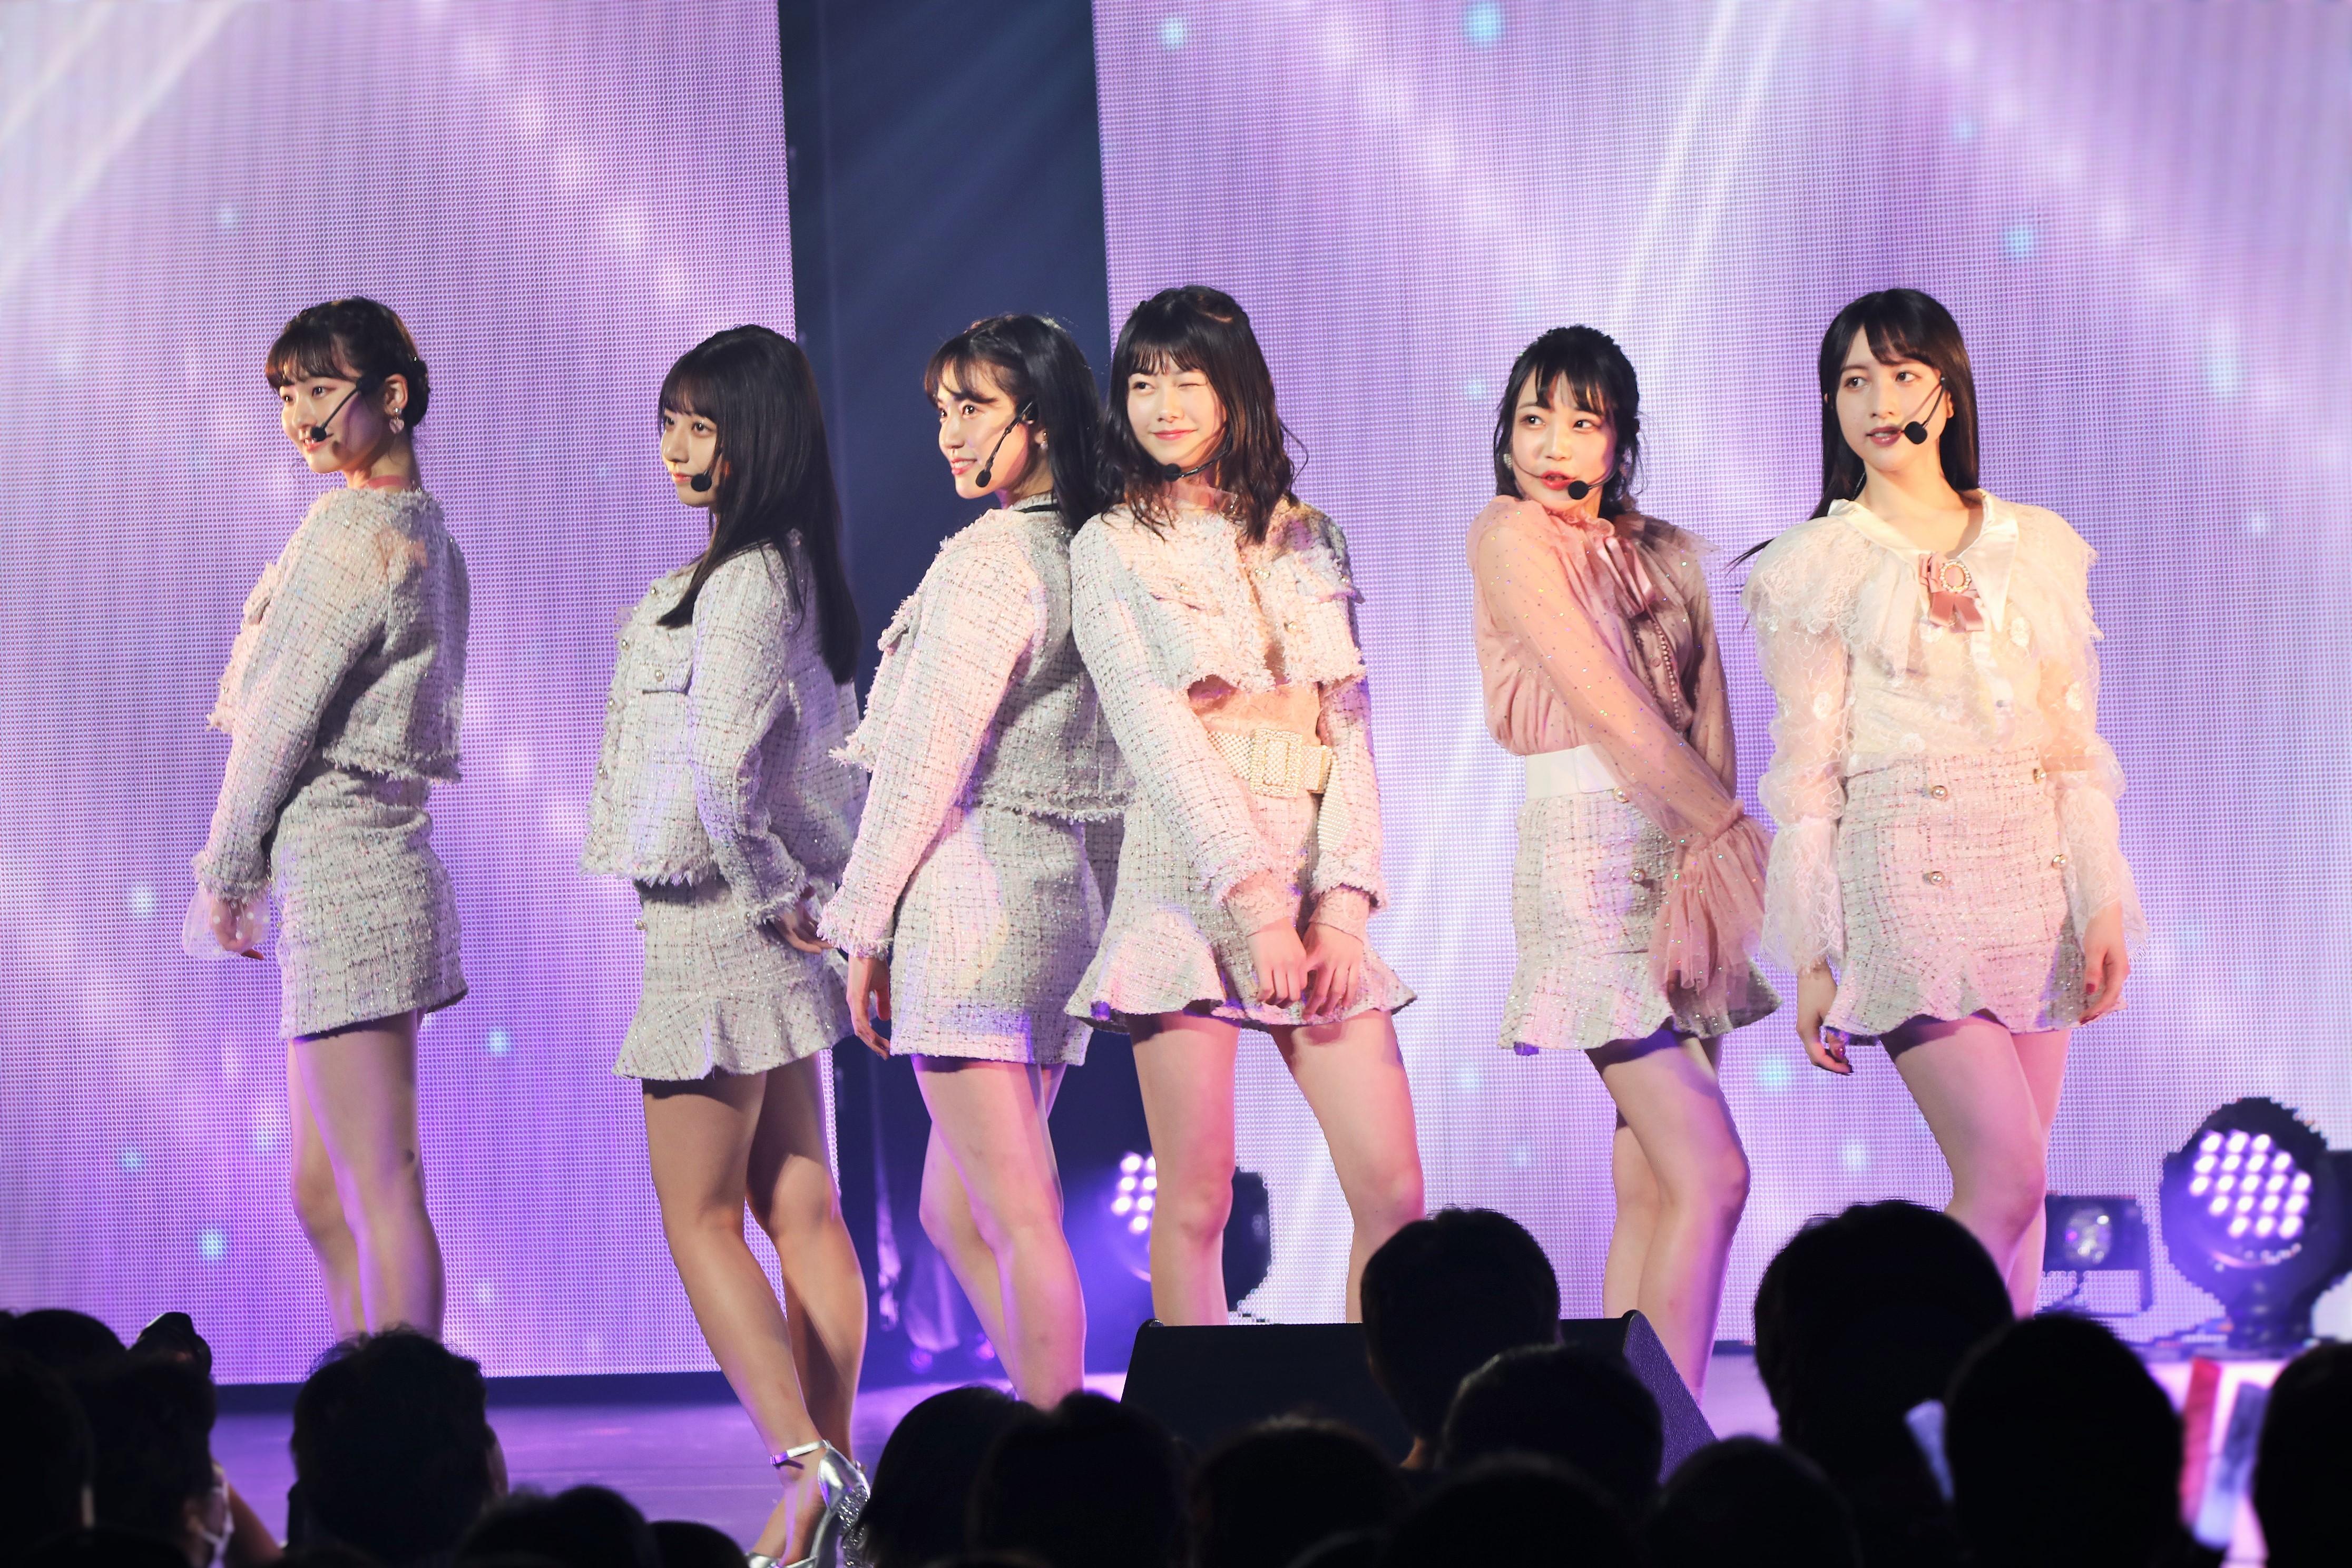 AKB48単独コンサートでのTinTlip 浅井七海、鈴木優香、下尾みう、千葉恵里、佐藤美波、永野芹佳(2020年1月)